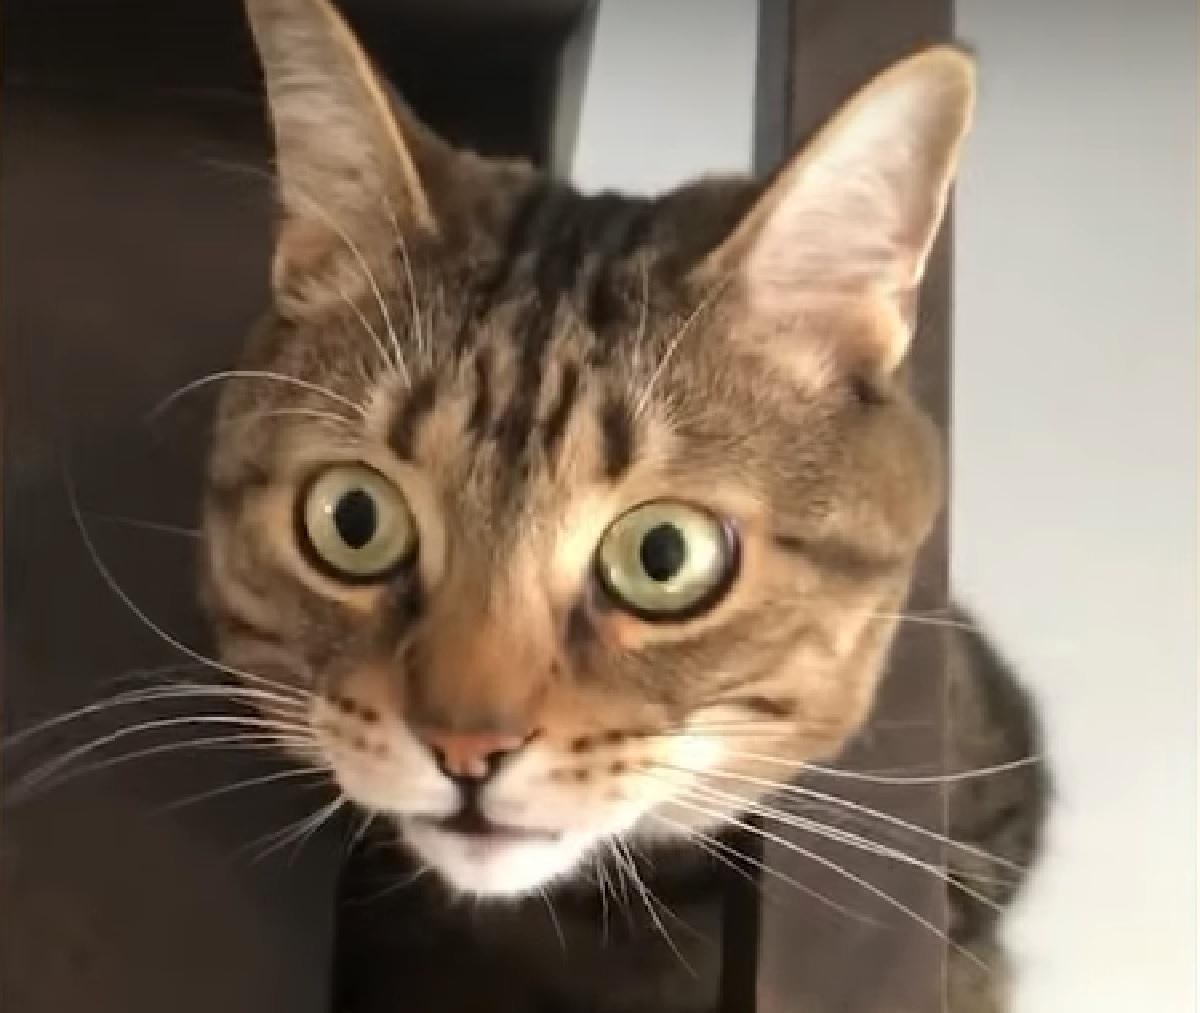 midou gattino problema con testa